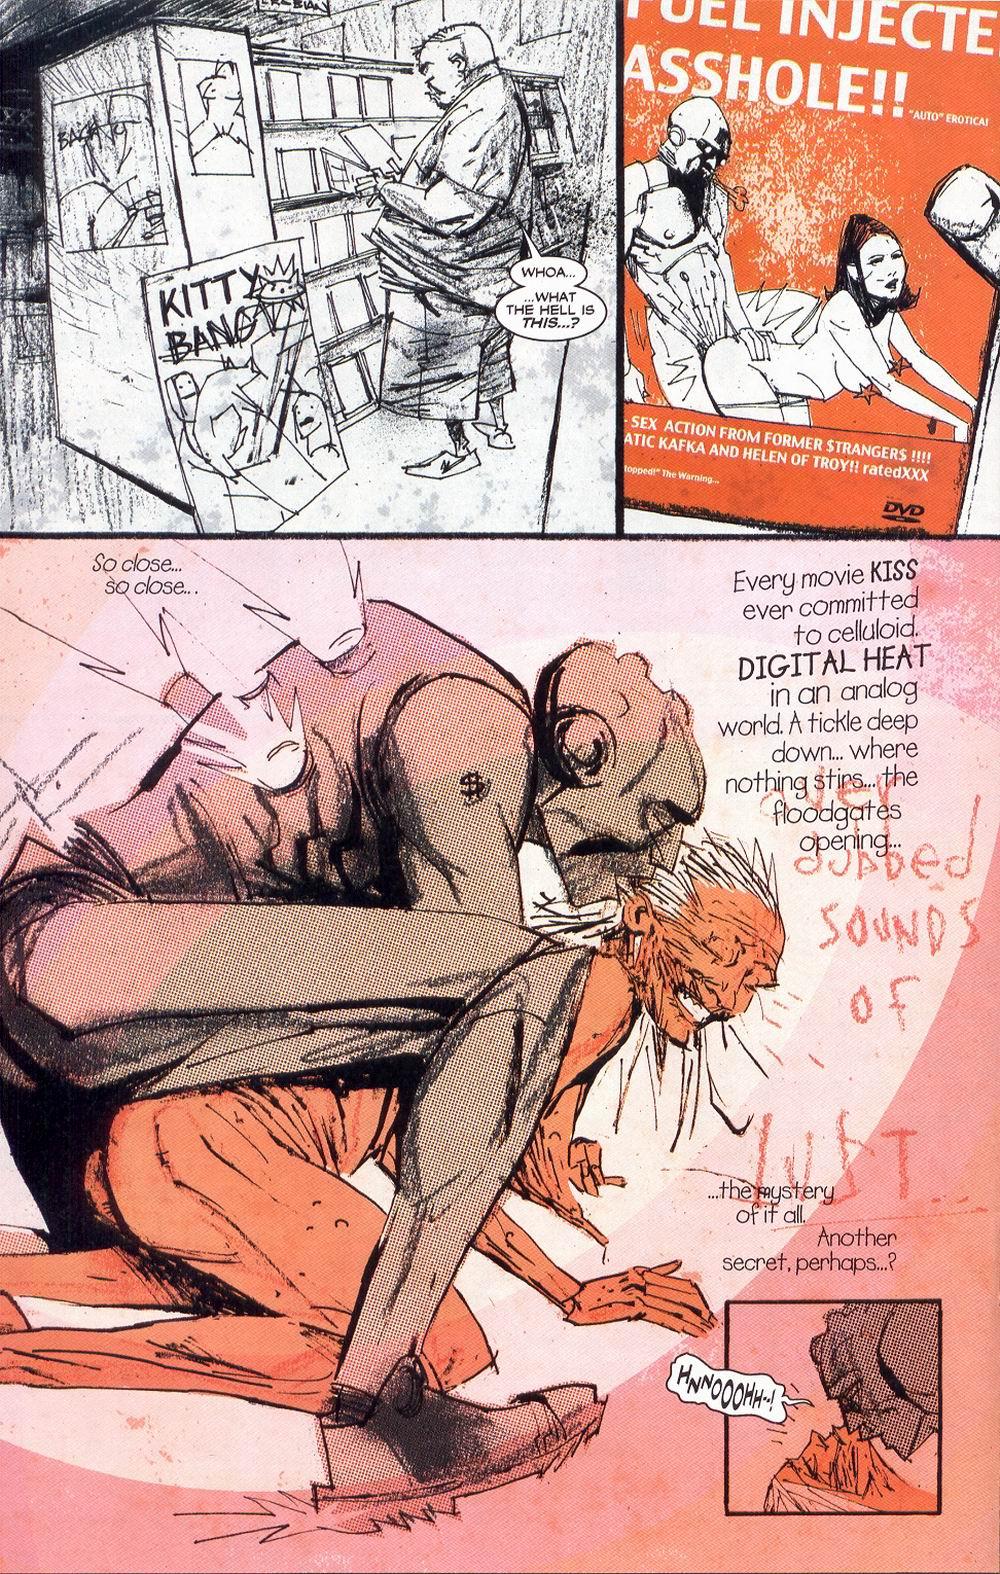 Read online Automatic Kafka comic -  Issue #6 - 15